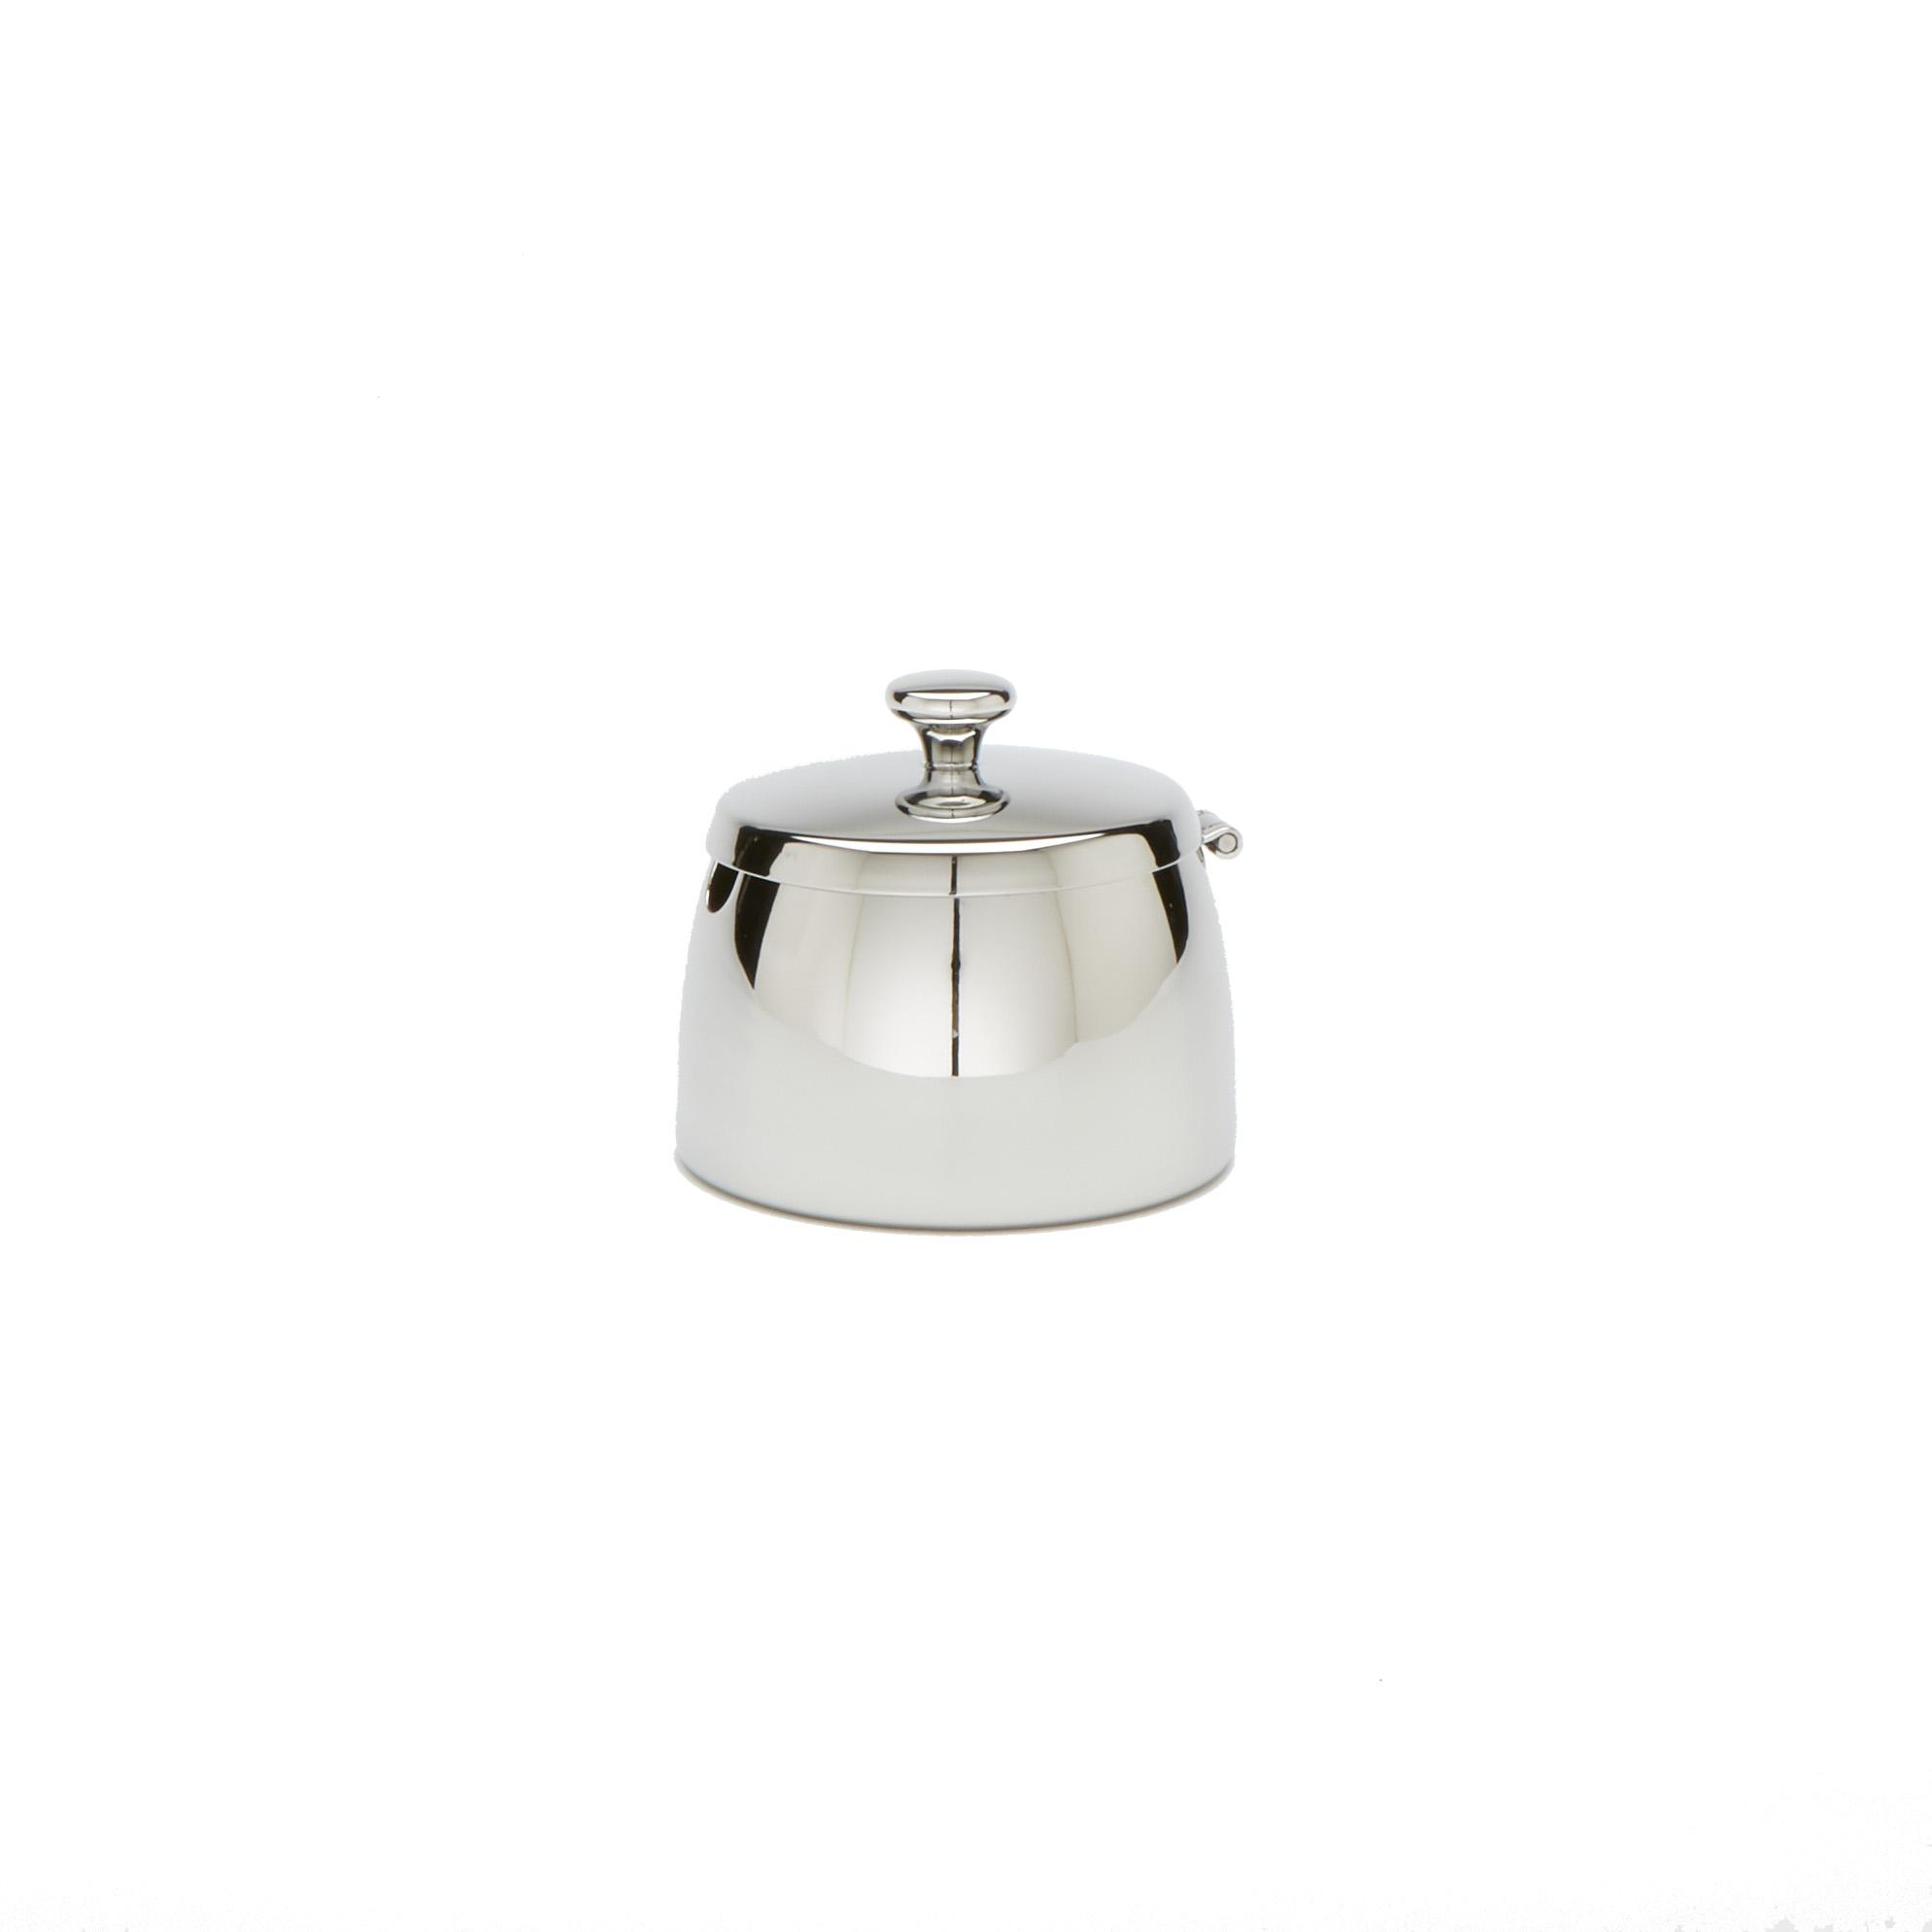 American Metalcraft DWS5 sugar bowl